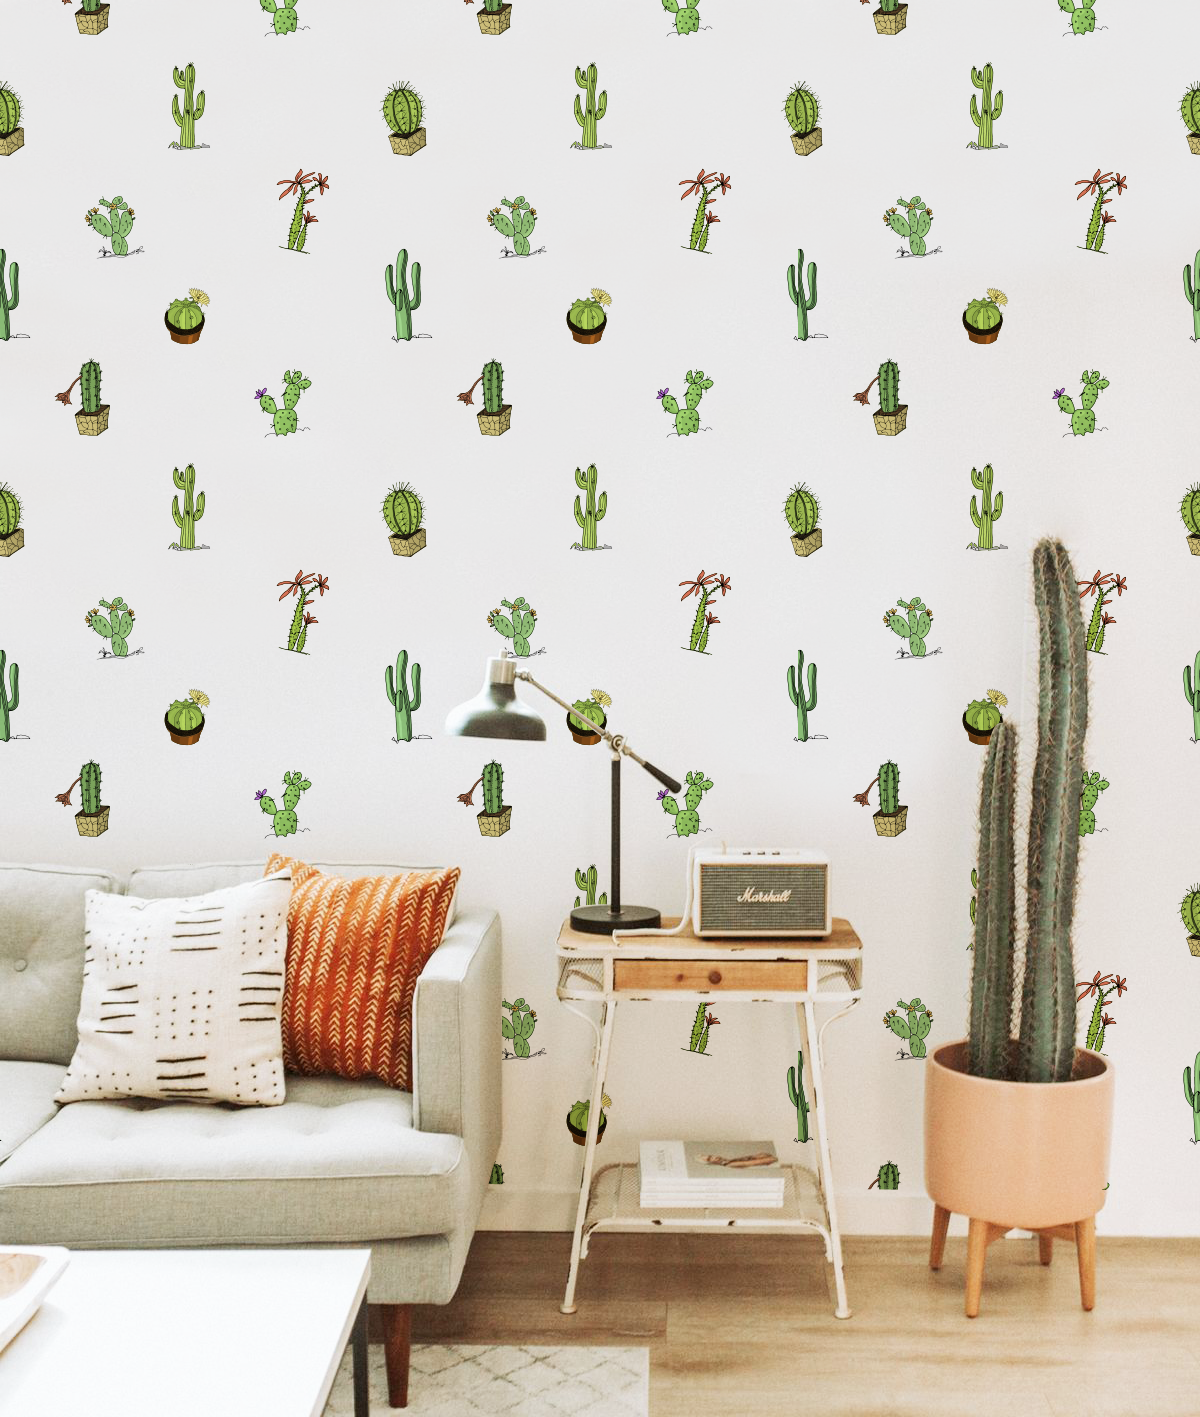 Best Cute Cactis Pots Removable Wallpaper Bedroom Kids Room 400 x 300